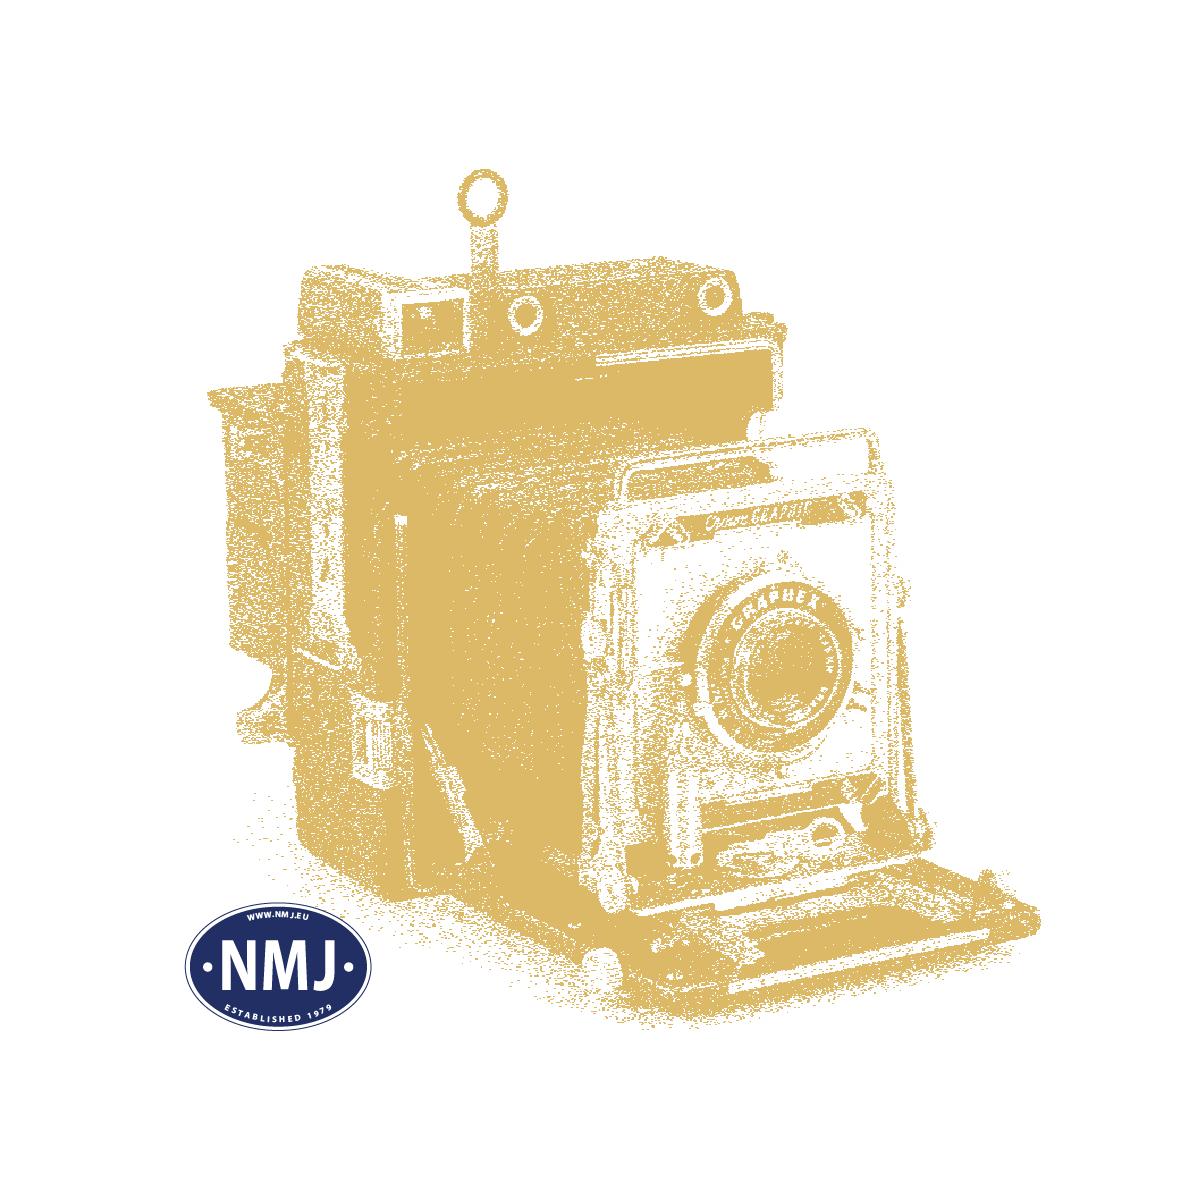 NOC61104 - Laser-cut lim